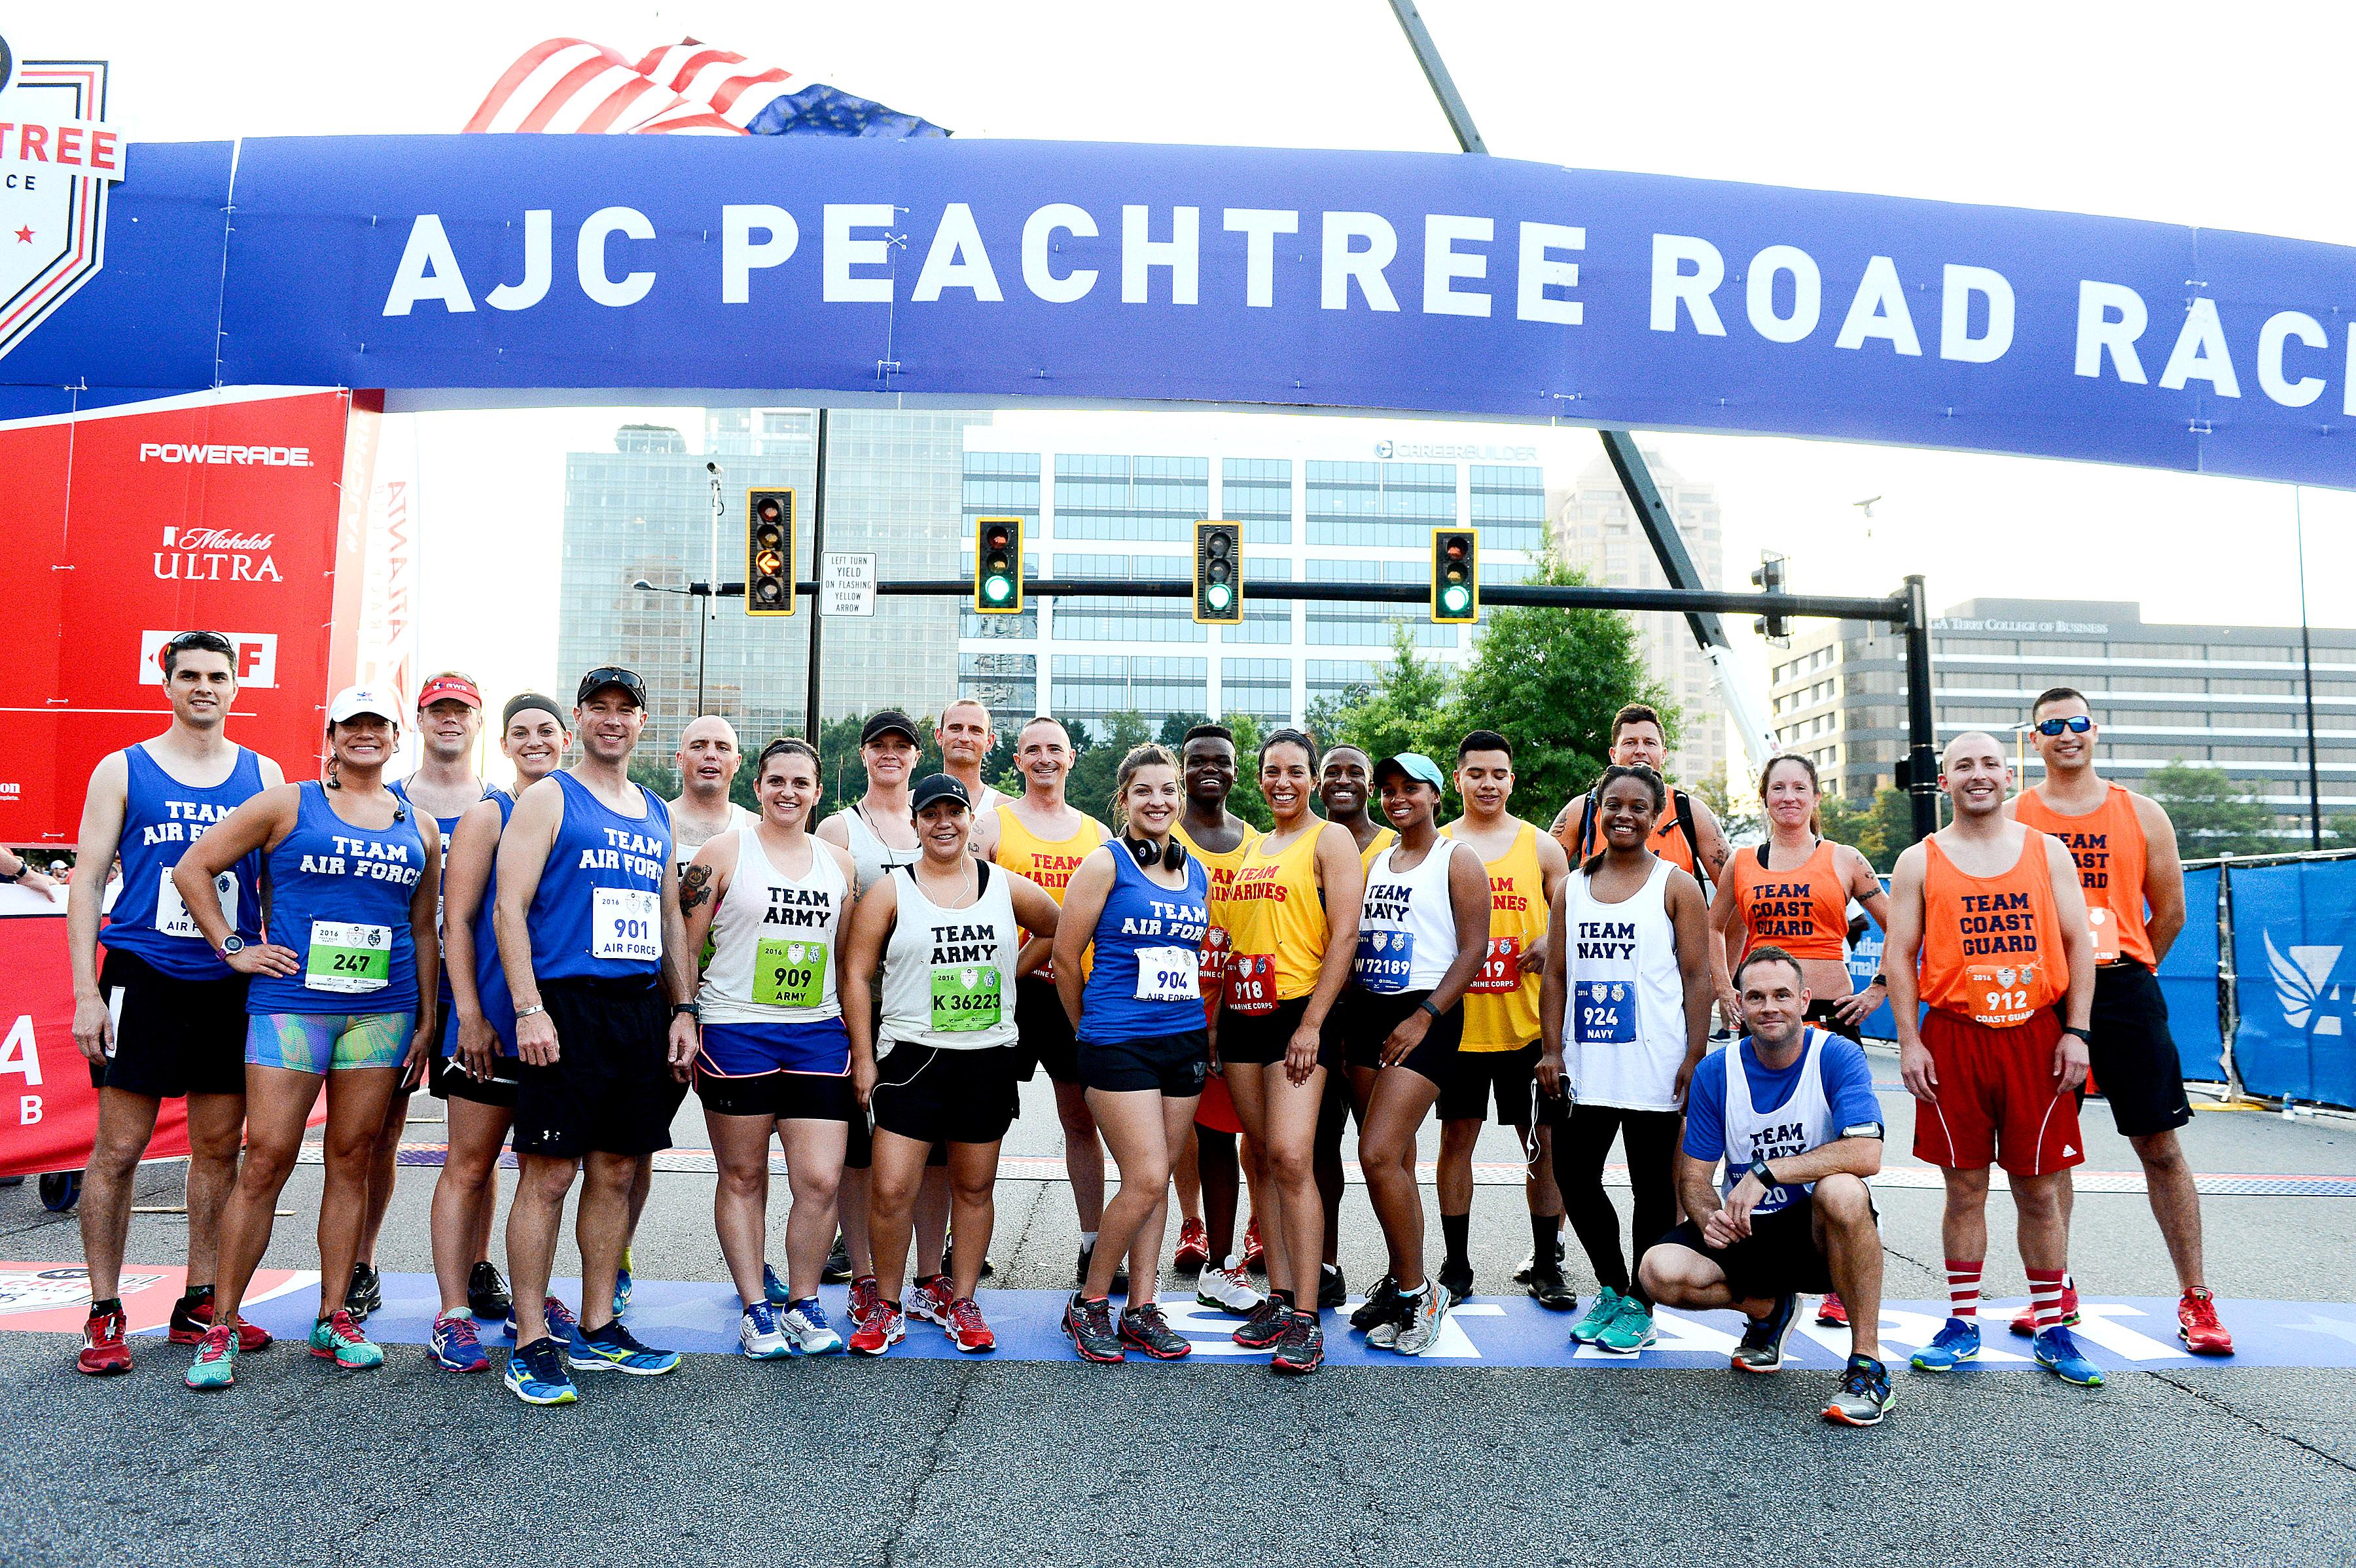 Peachtree road race results 2015 - 2016 Peachtree Road Race Atlanta Georgia July 4 2016 Photo Bruce Wodder